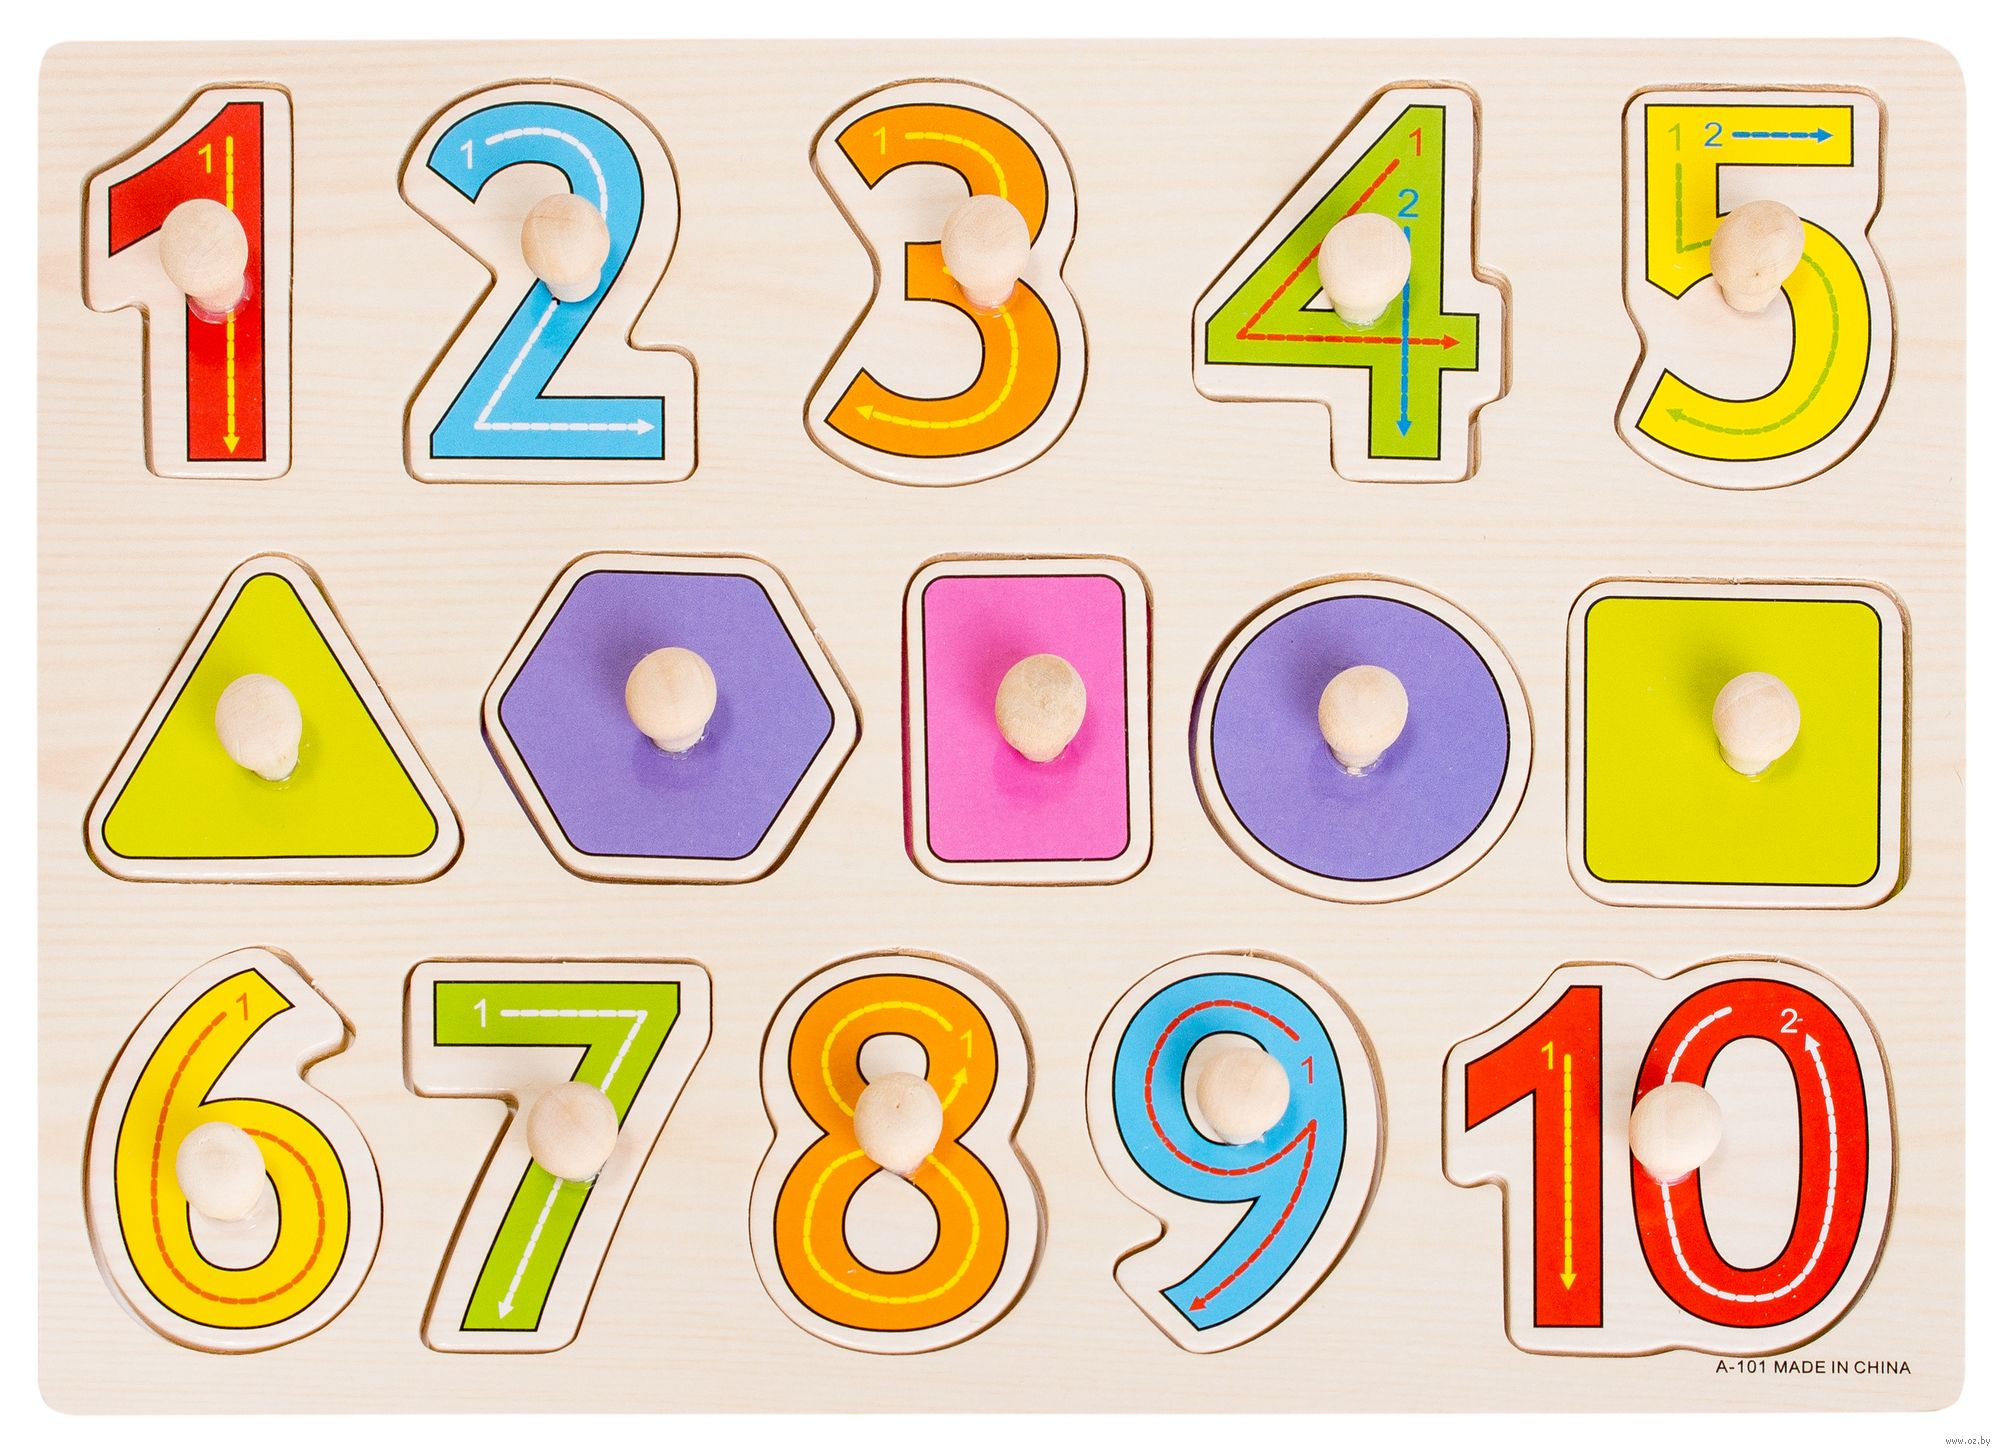 Цифры и геометрические фигуры картинки